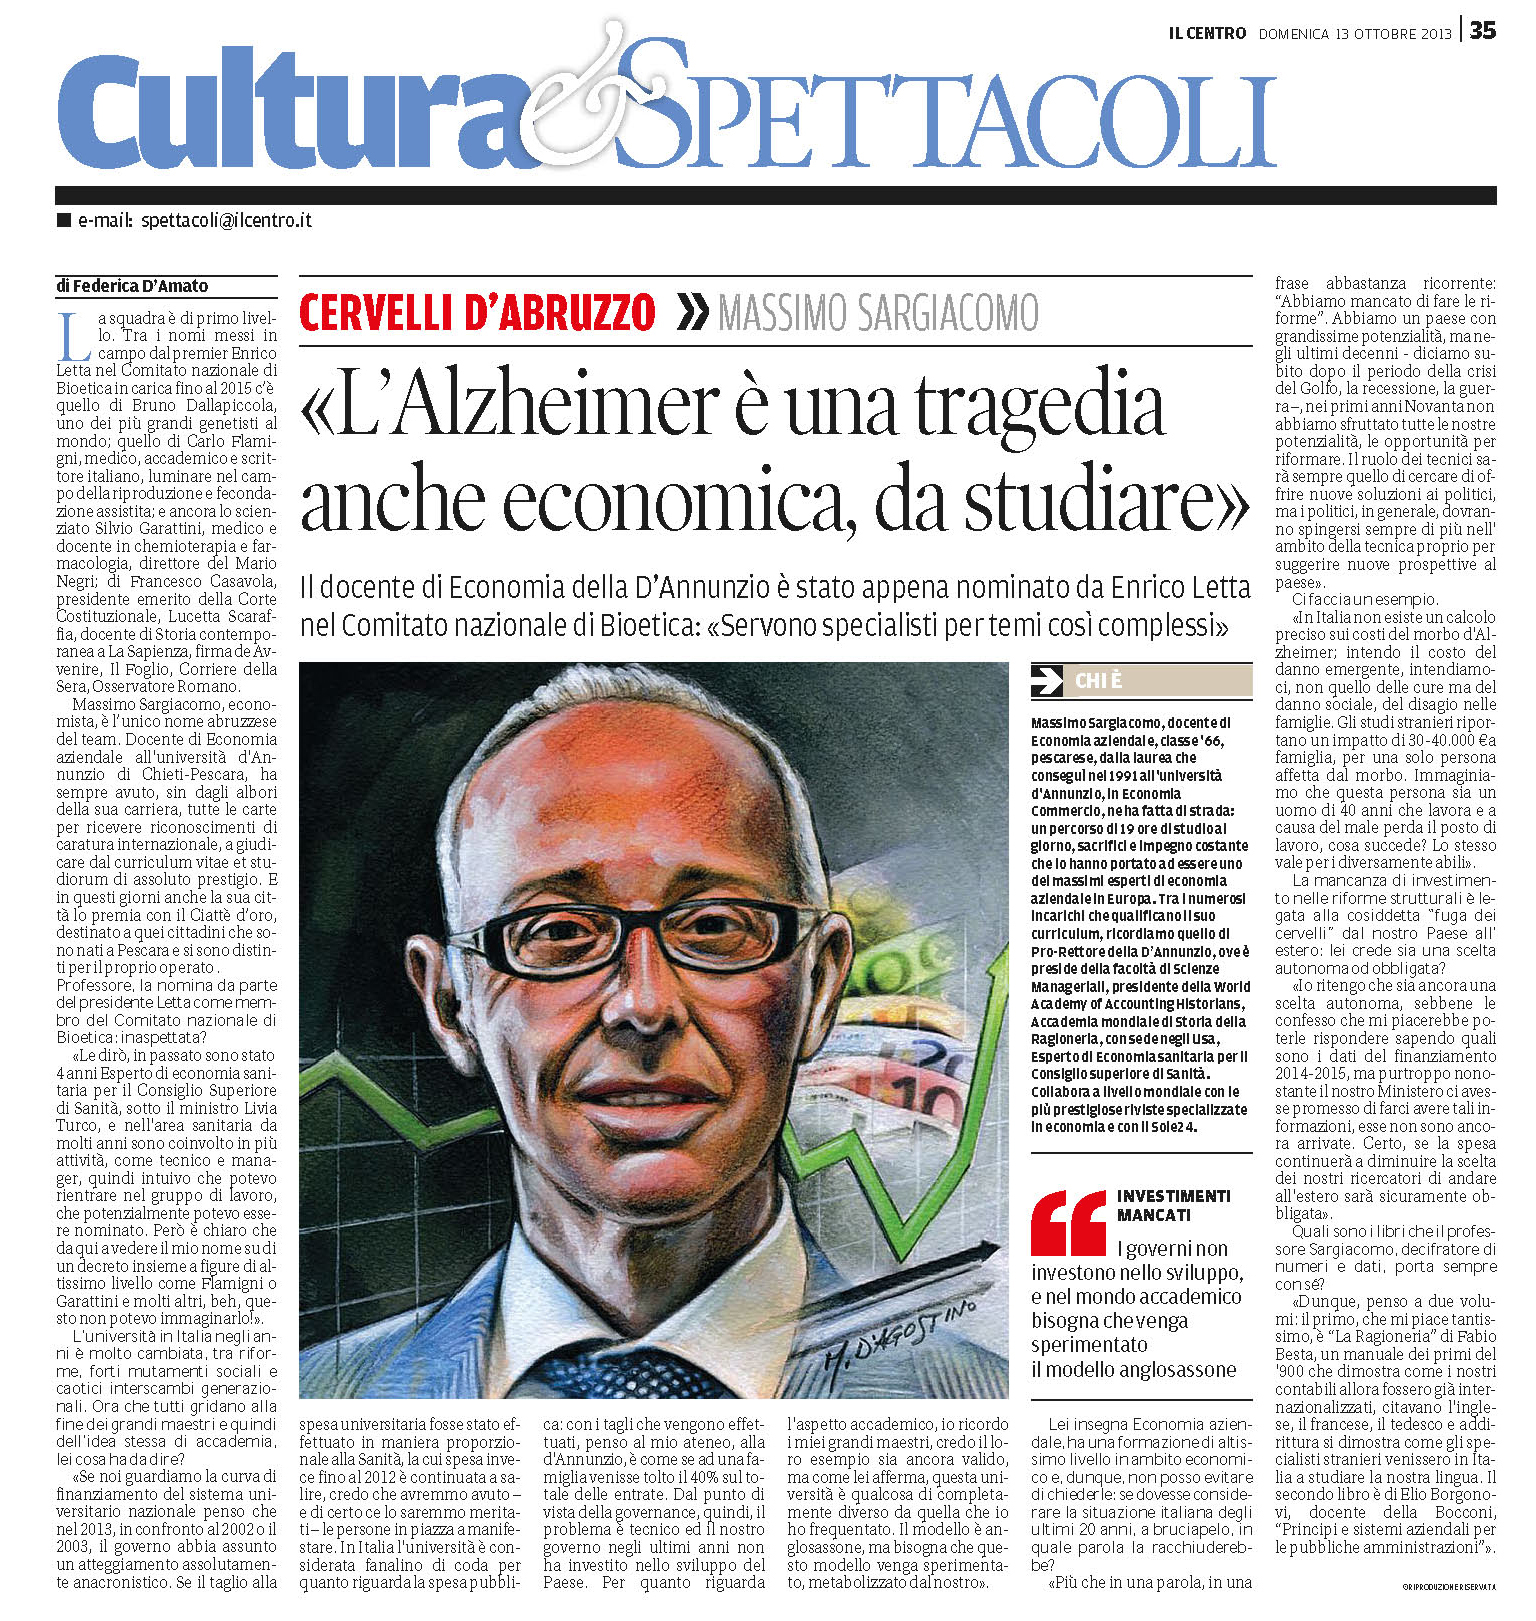 Massimo Sargiacomo - Il Centro ottobre 2013